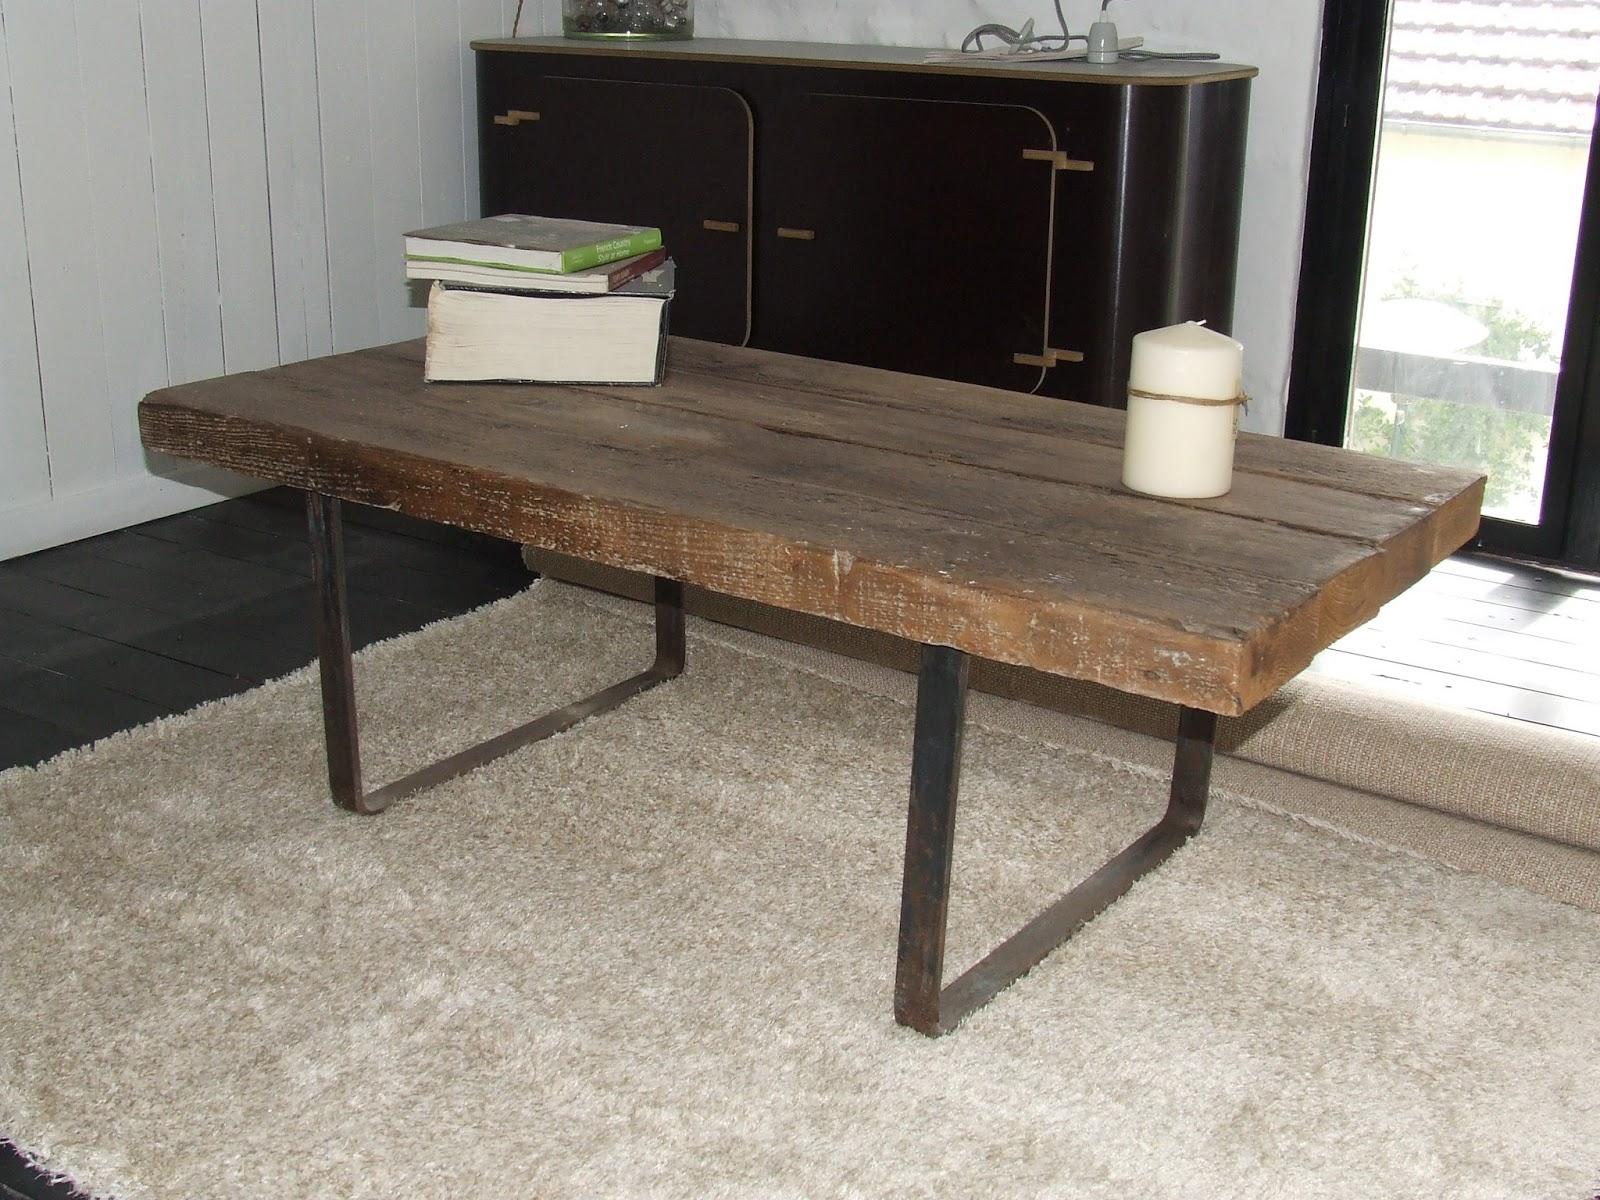 ferronnerie le fur table basse ossature m tallique. Black Bedroom Furniture Sets. Home Design Ideas